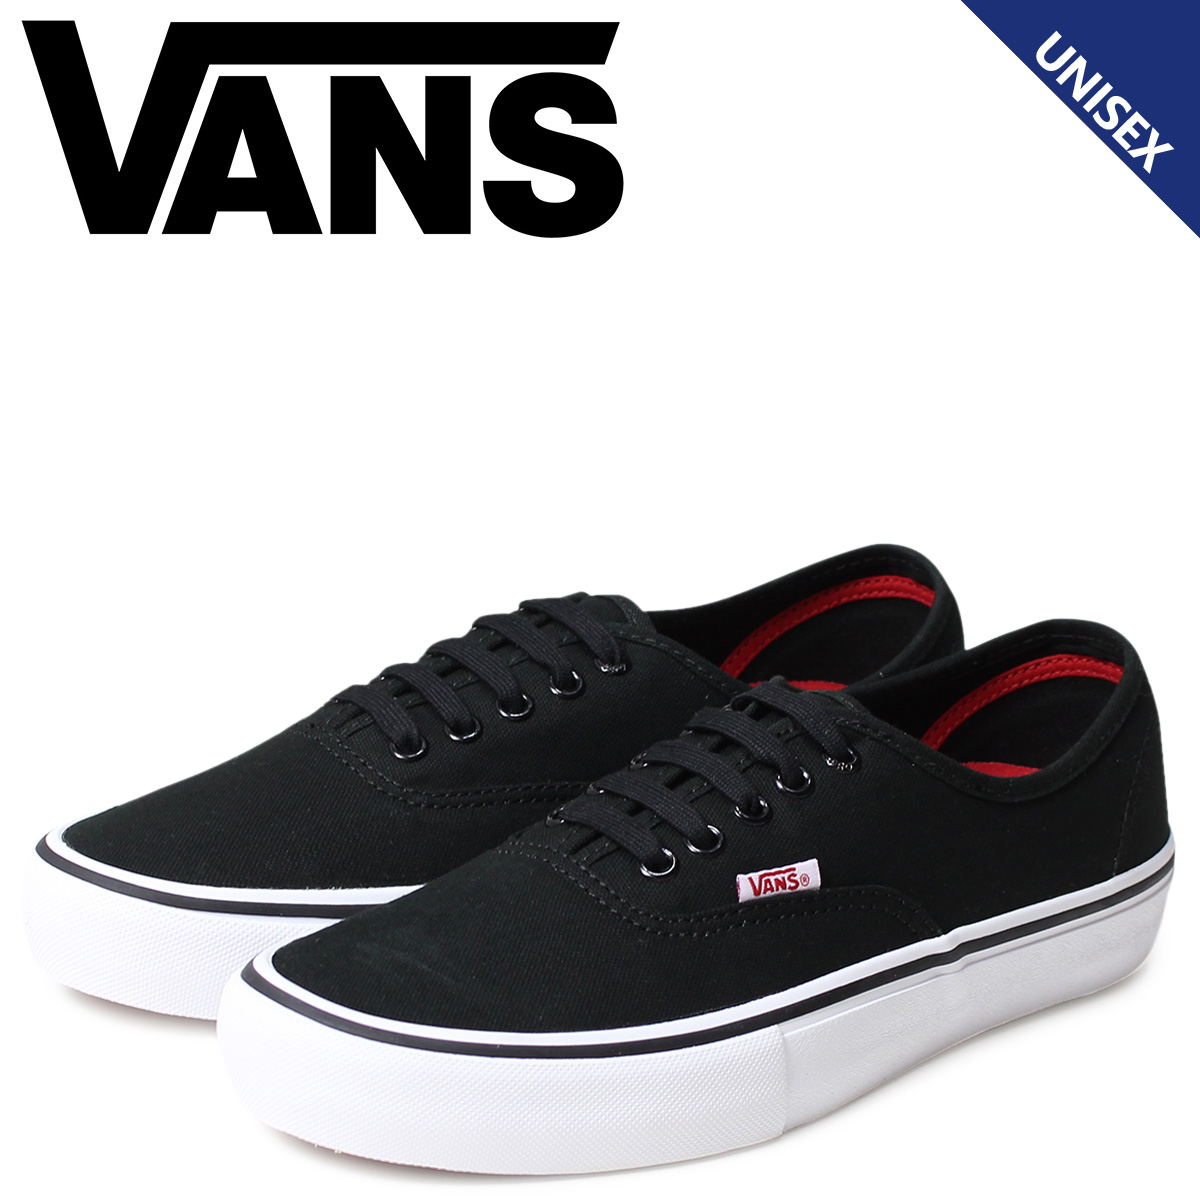 vans shoes japan price off 65% - www